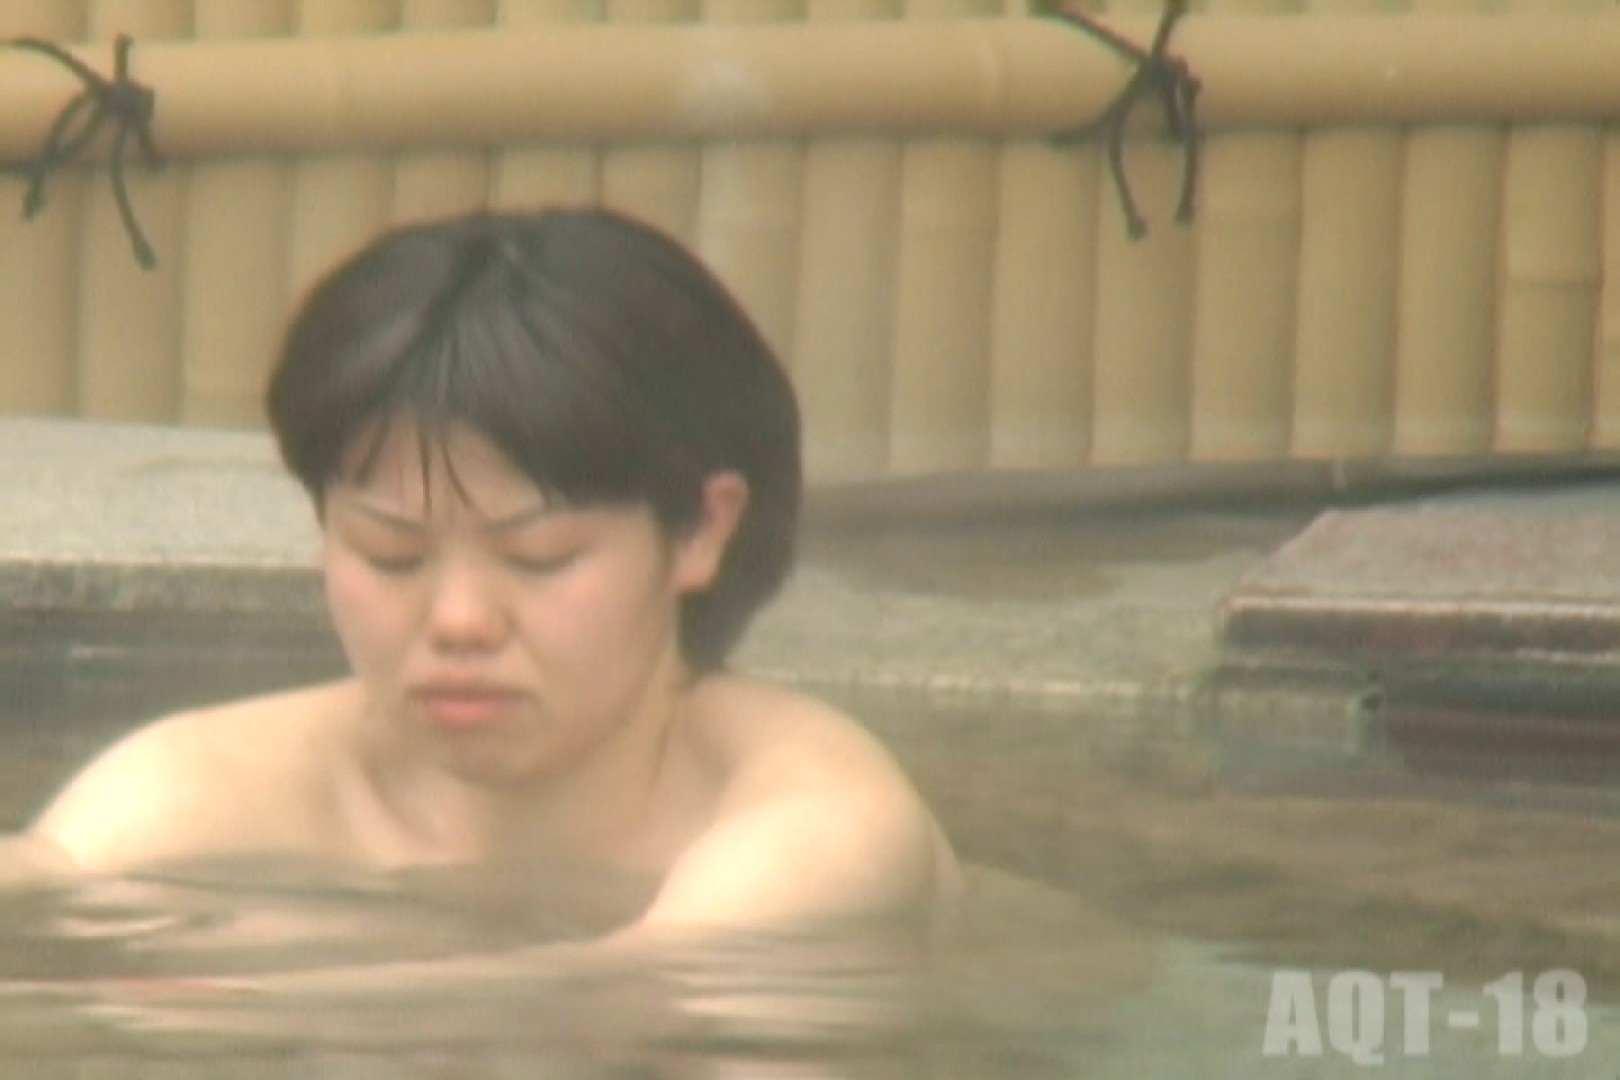 Aquaな露天風呂Vol.861 露天風呂 オメコ無修正動画無料 107連発 68